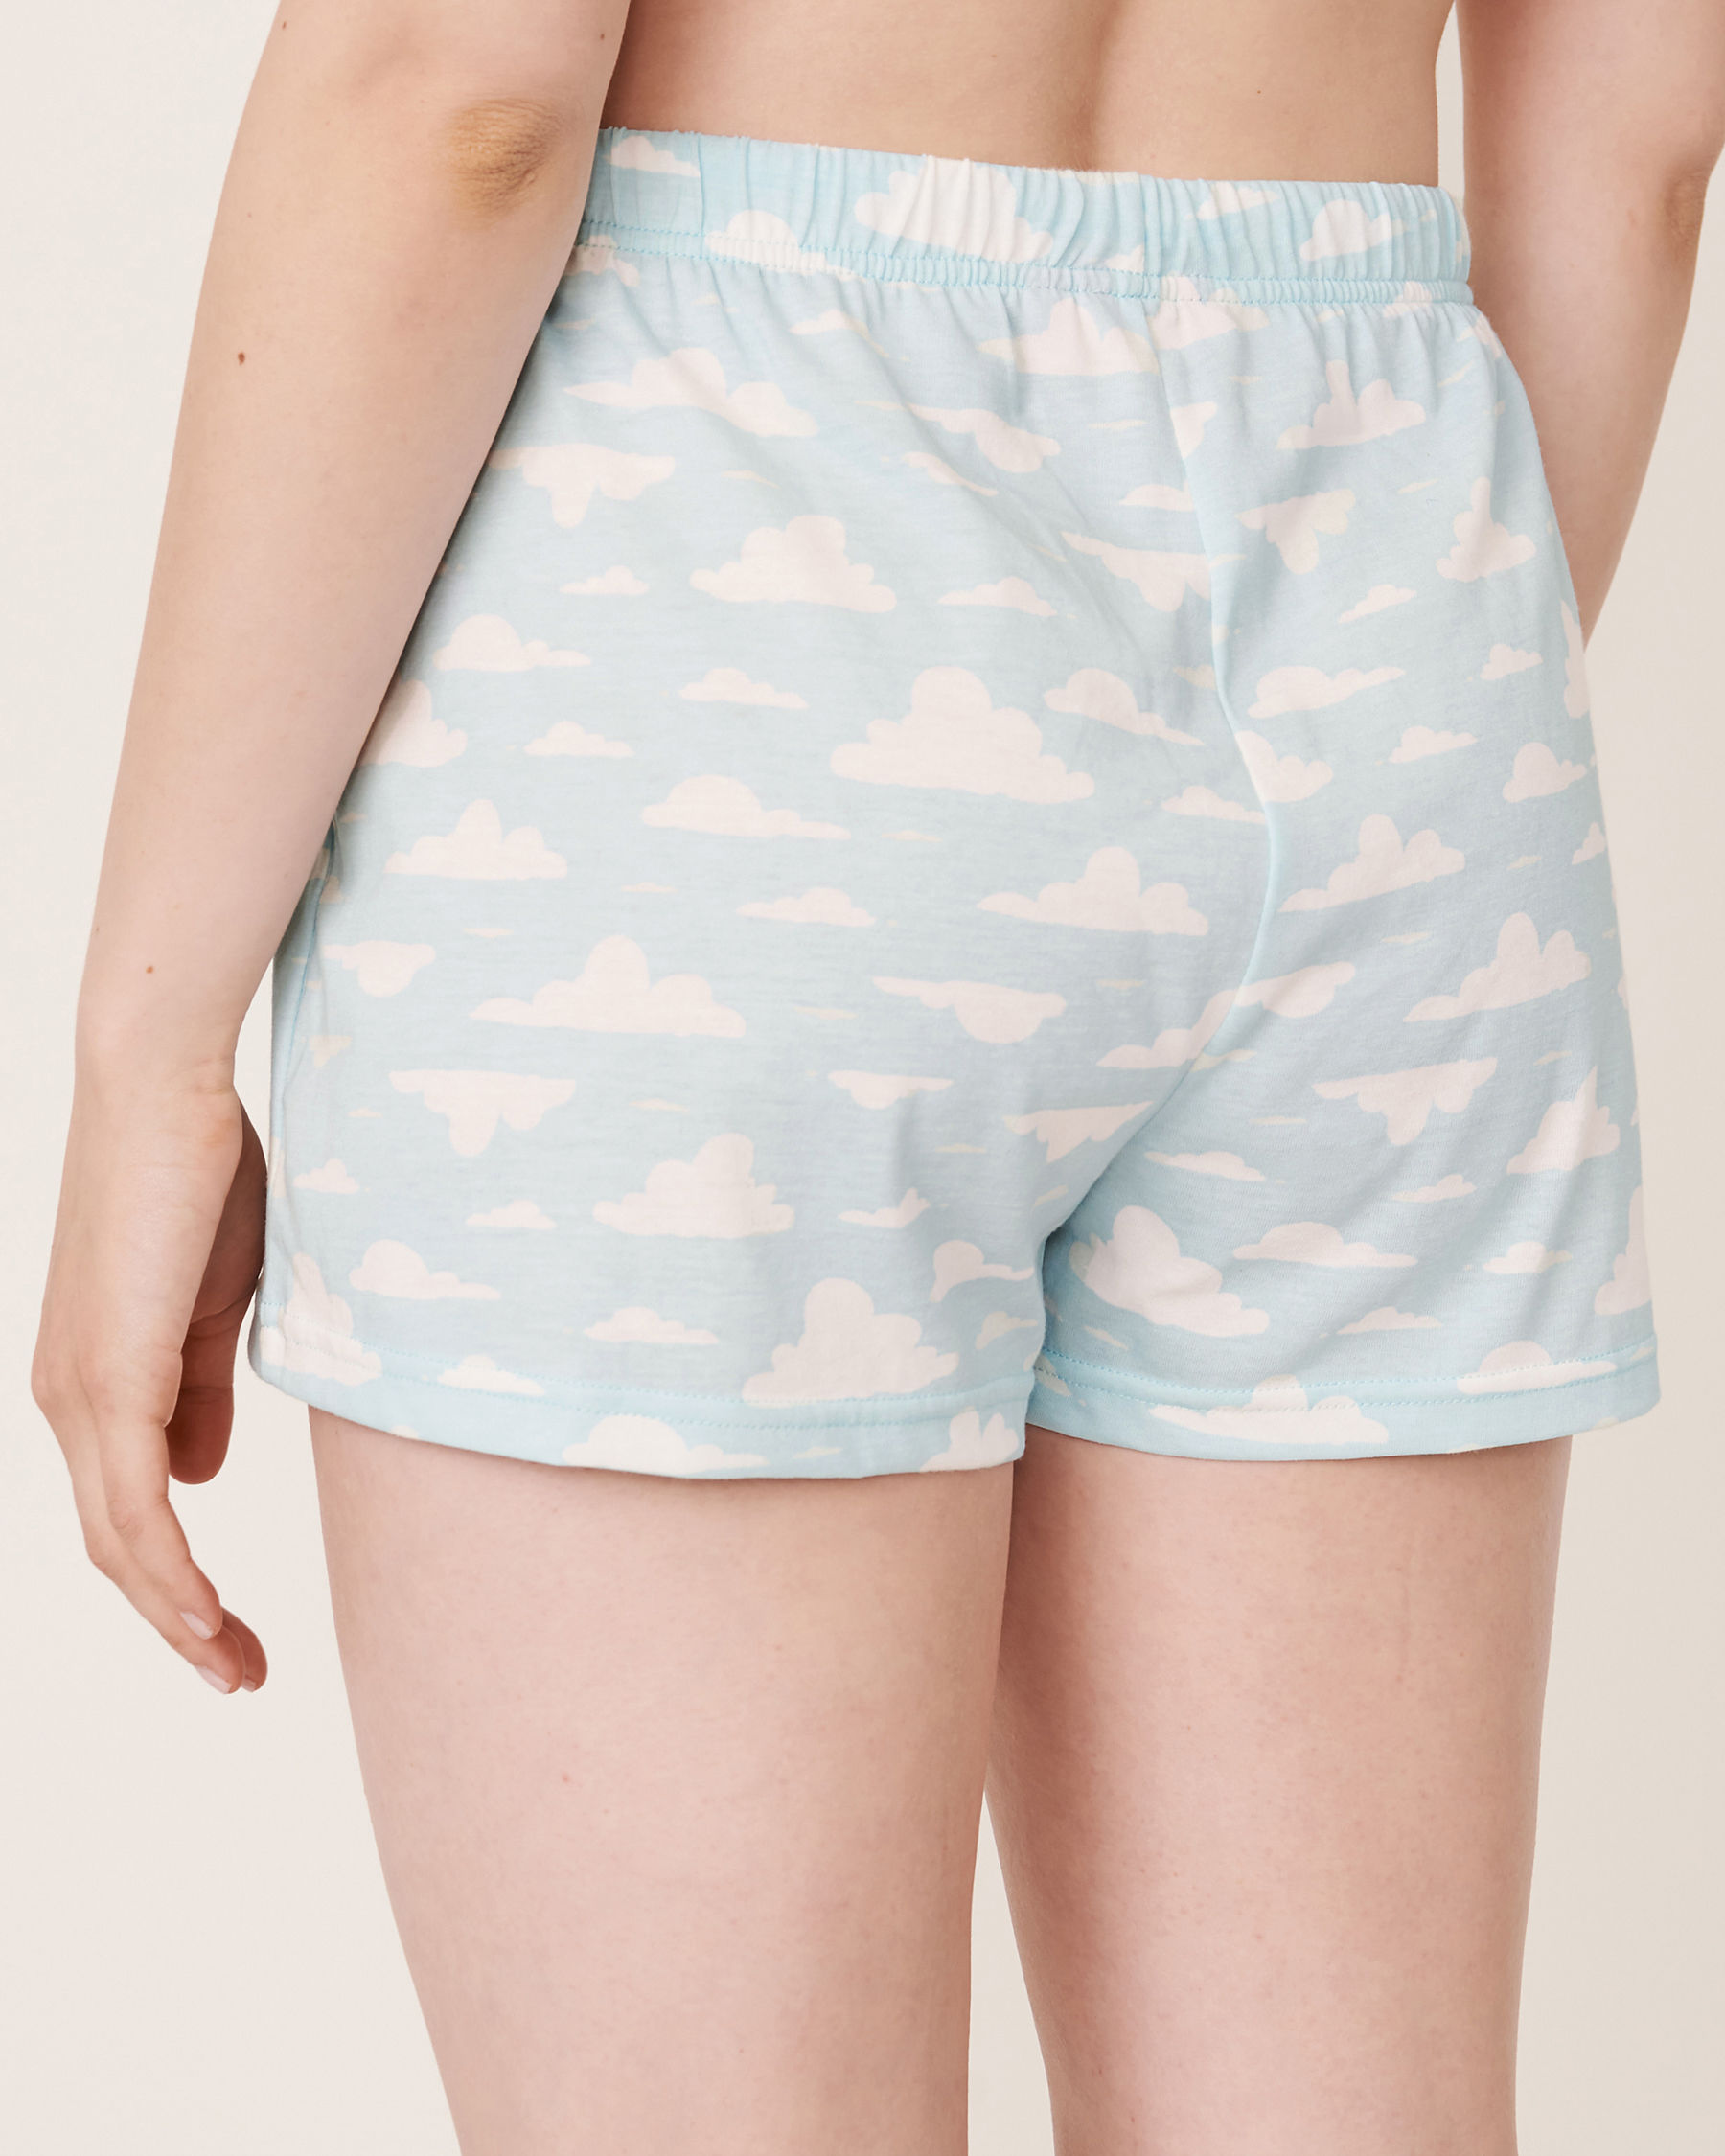 LA VIE EN ROSE Pyjama Short Clouds 40200158 - View2